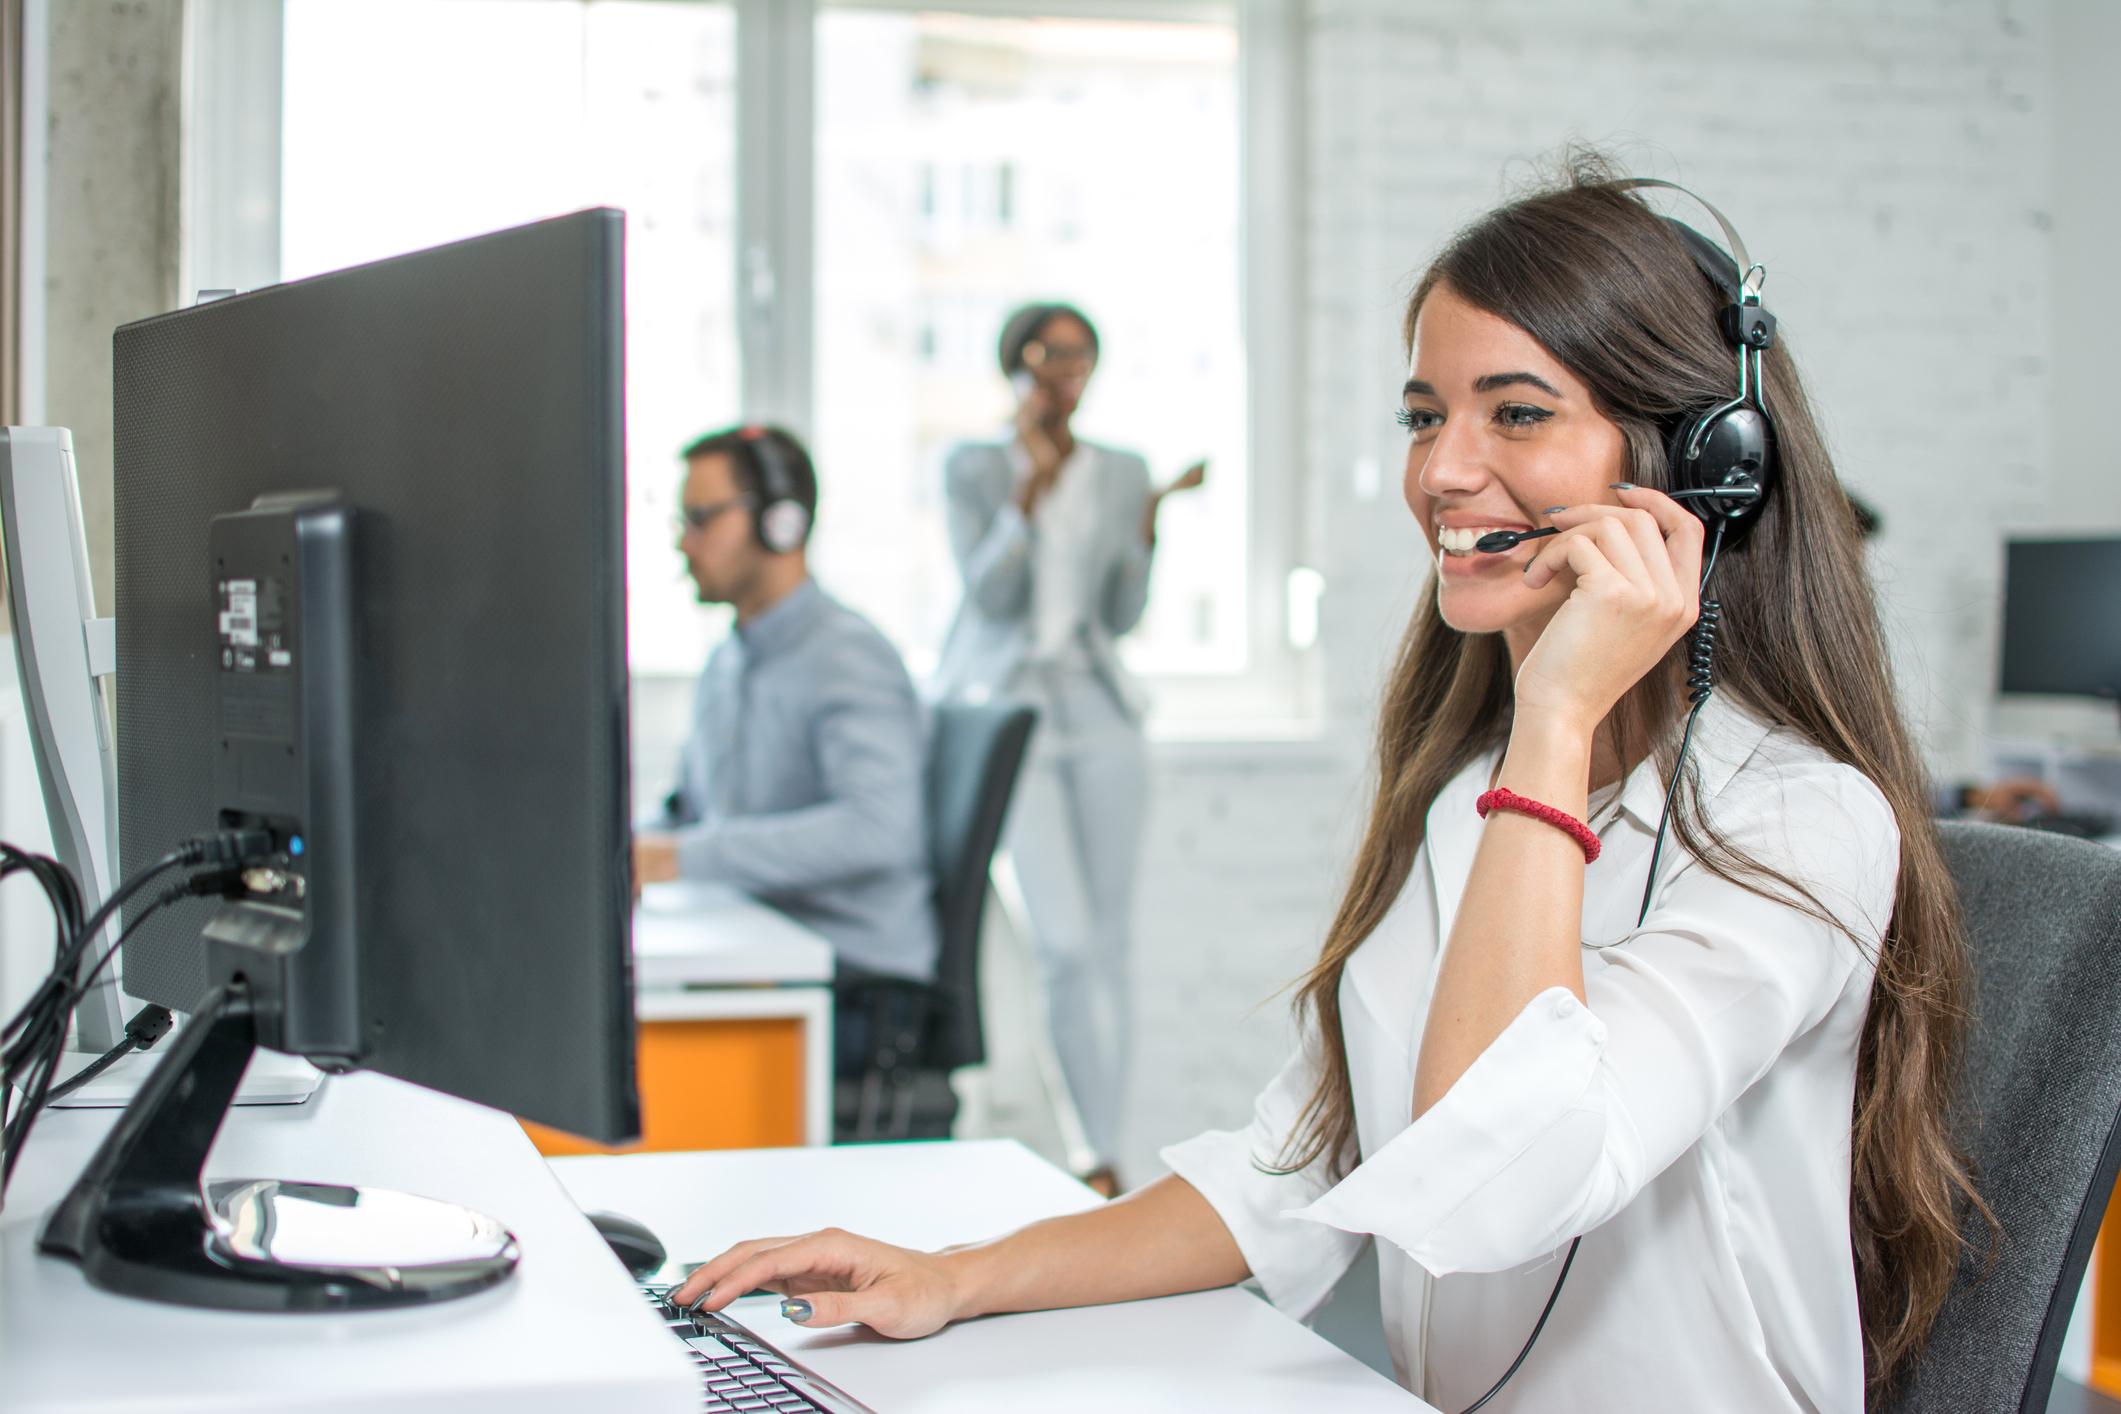 Female call center rep speaking on phone